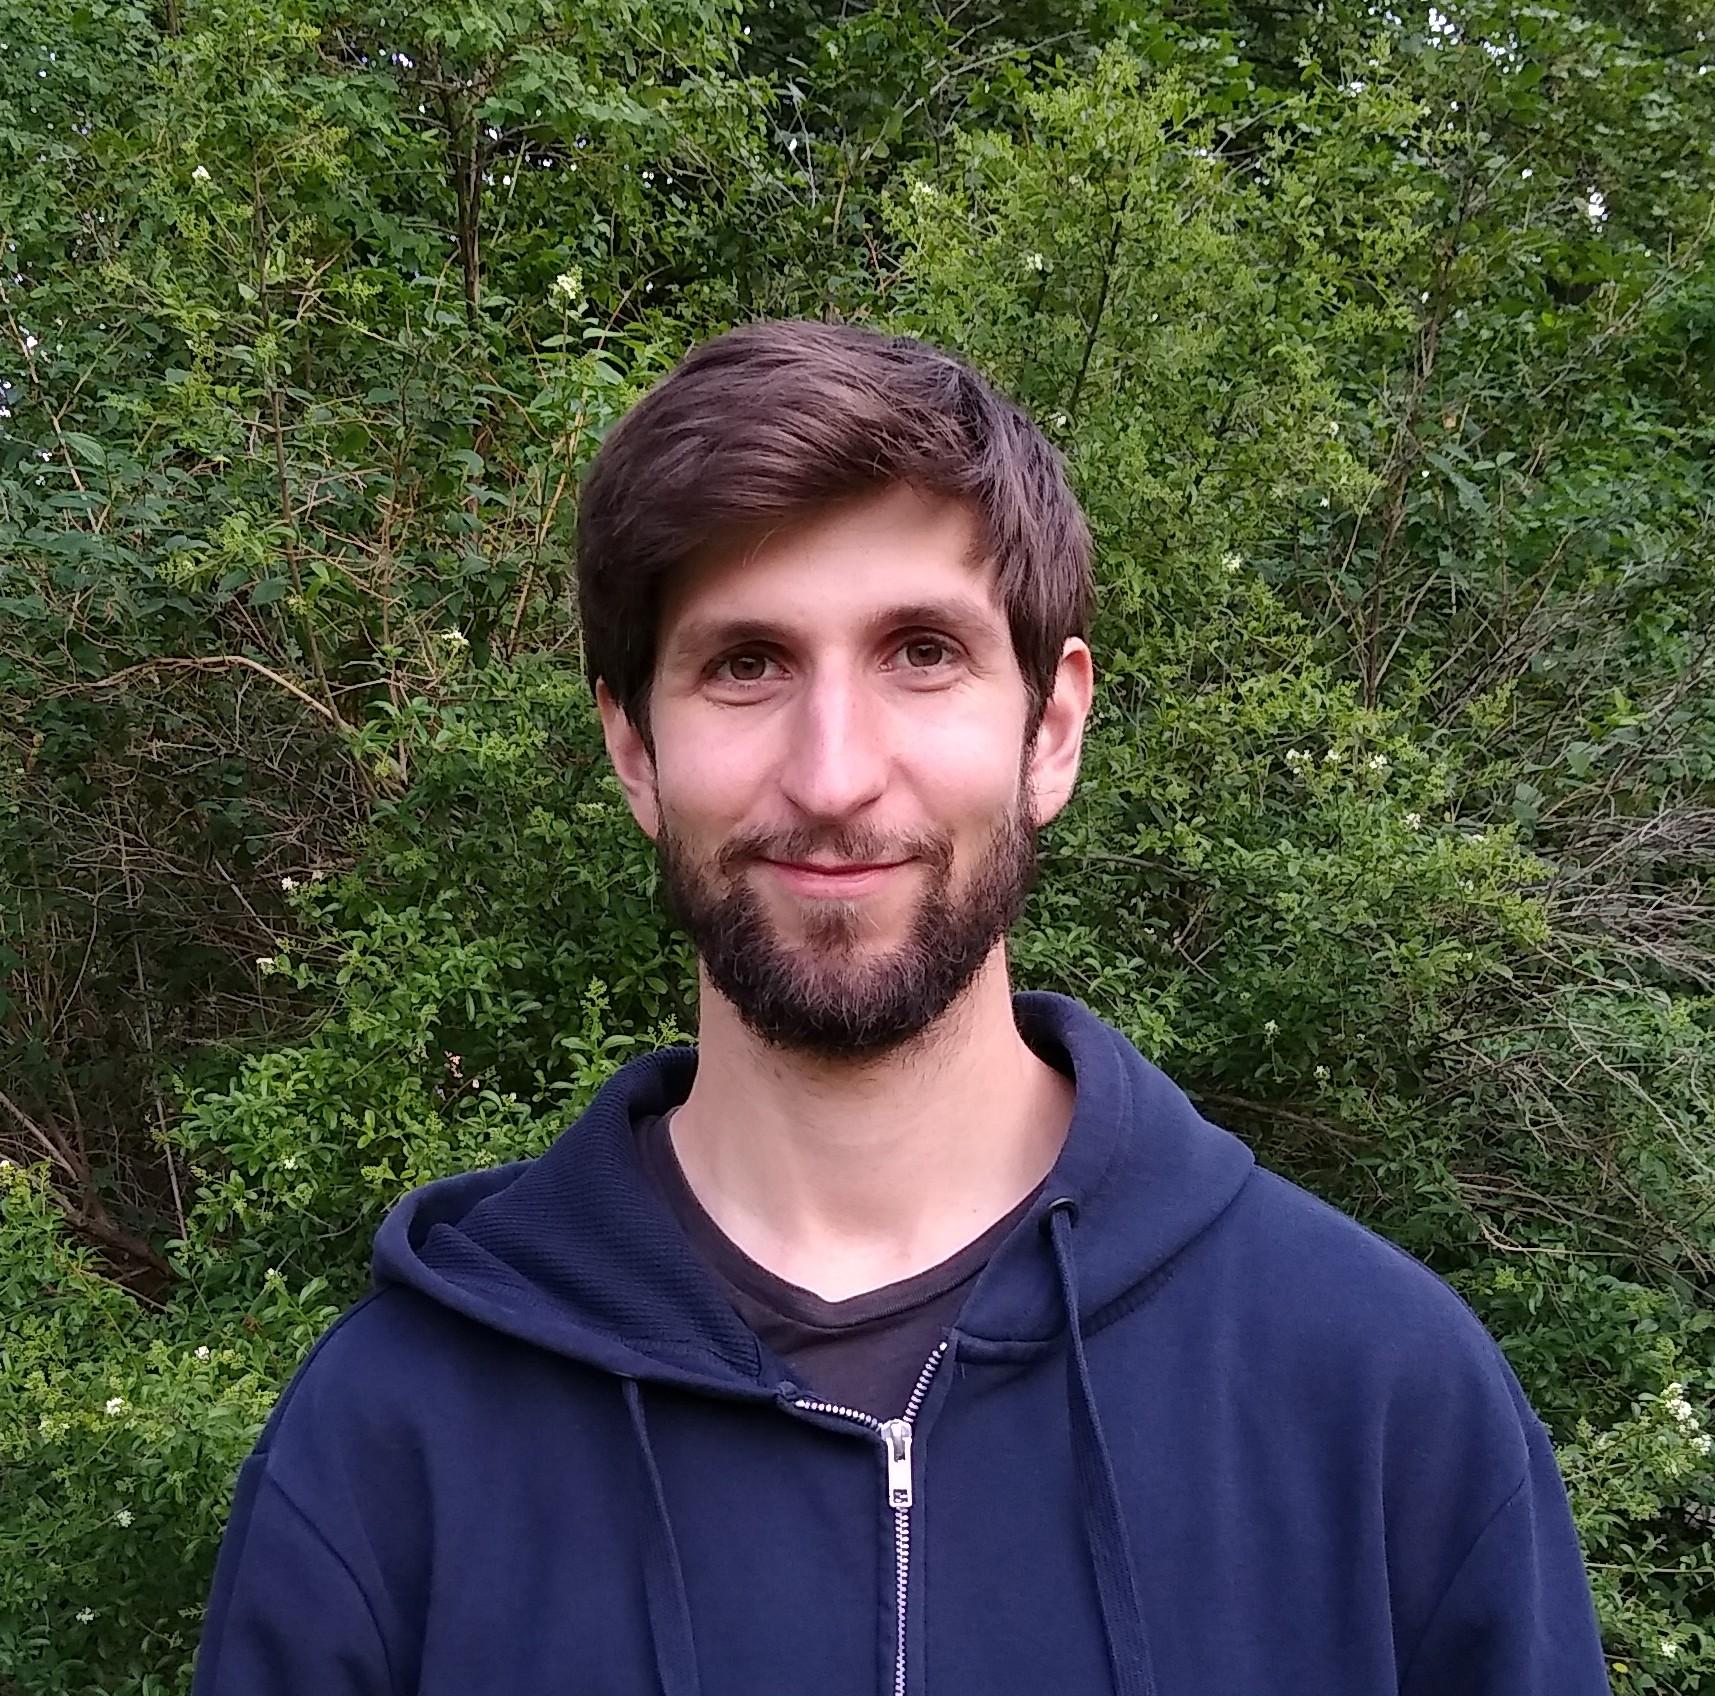 Manuel Grebenjak